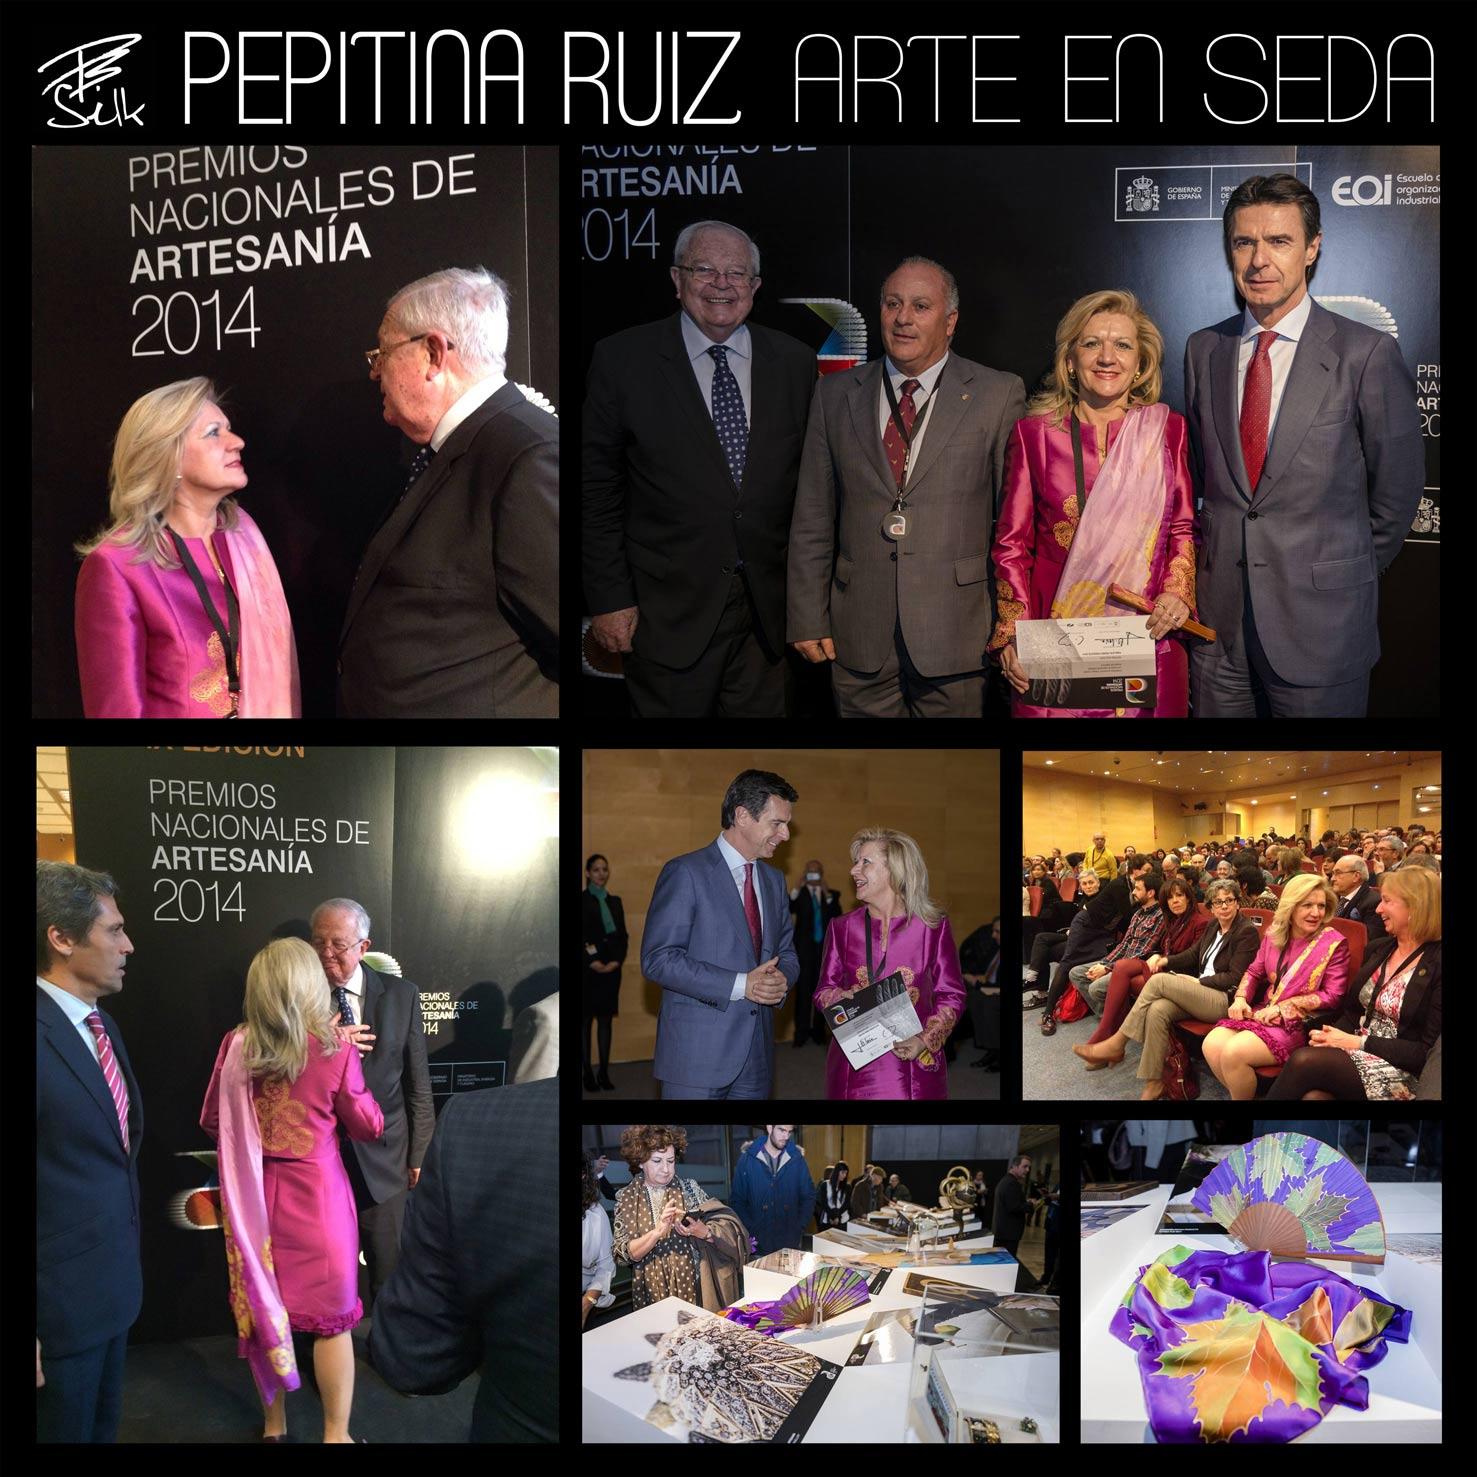 PREMIO NACIONAL DE ARTESANIA